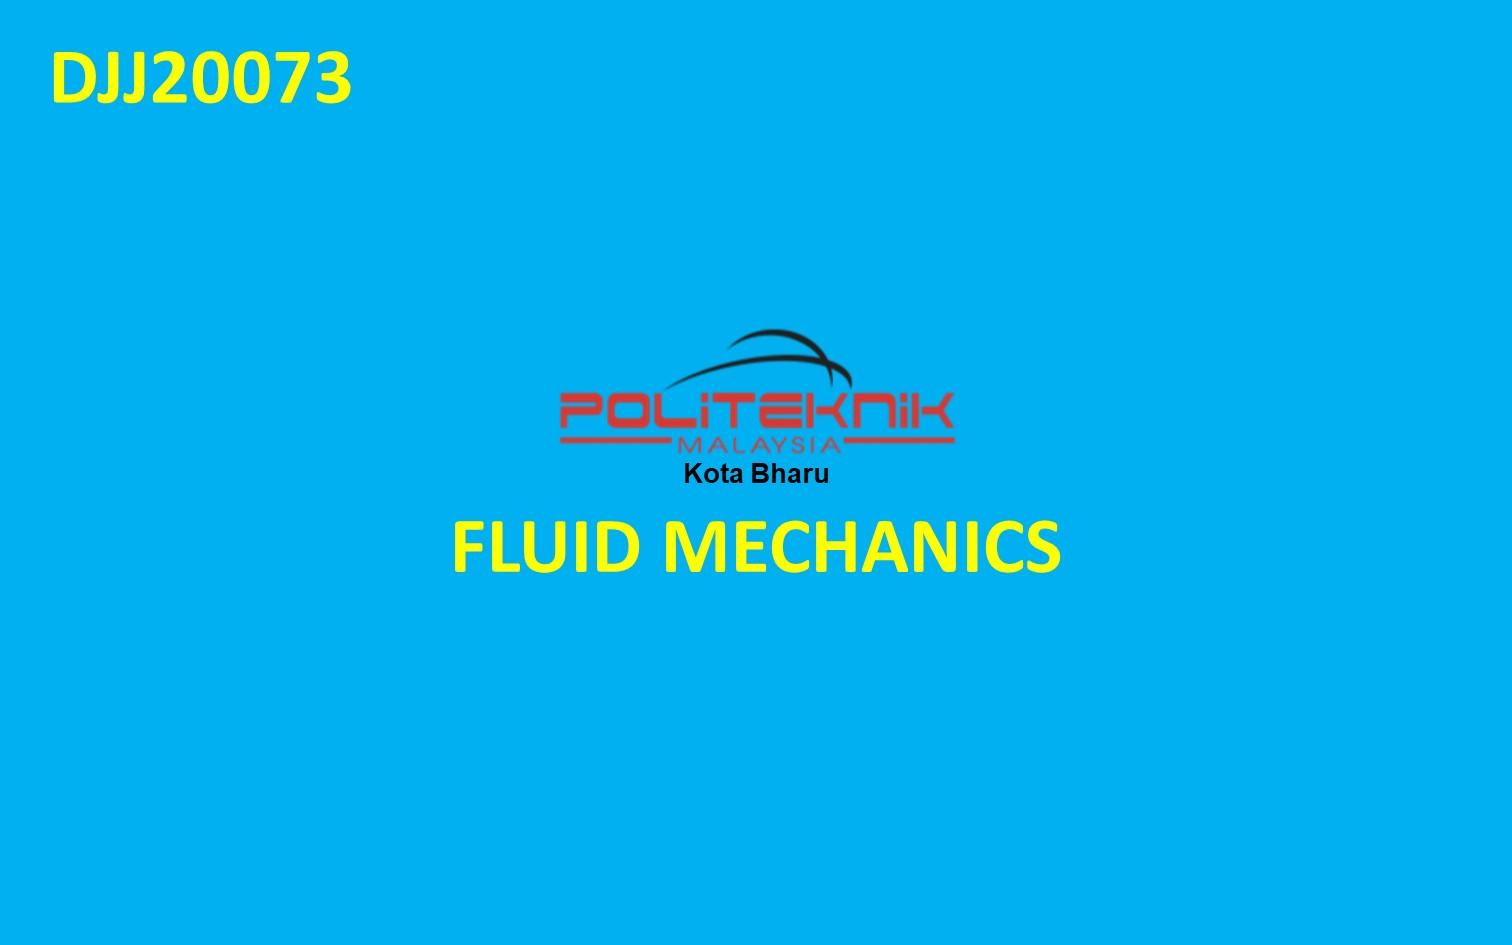 DJJ20073 FLUID MECHANICS